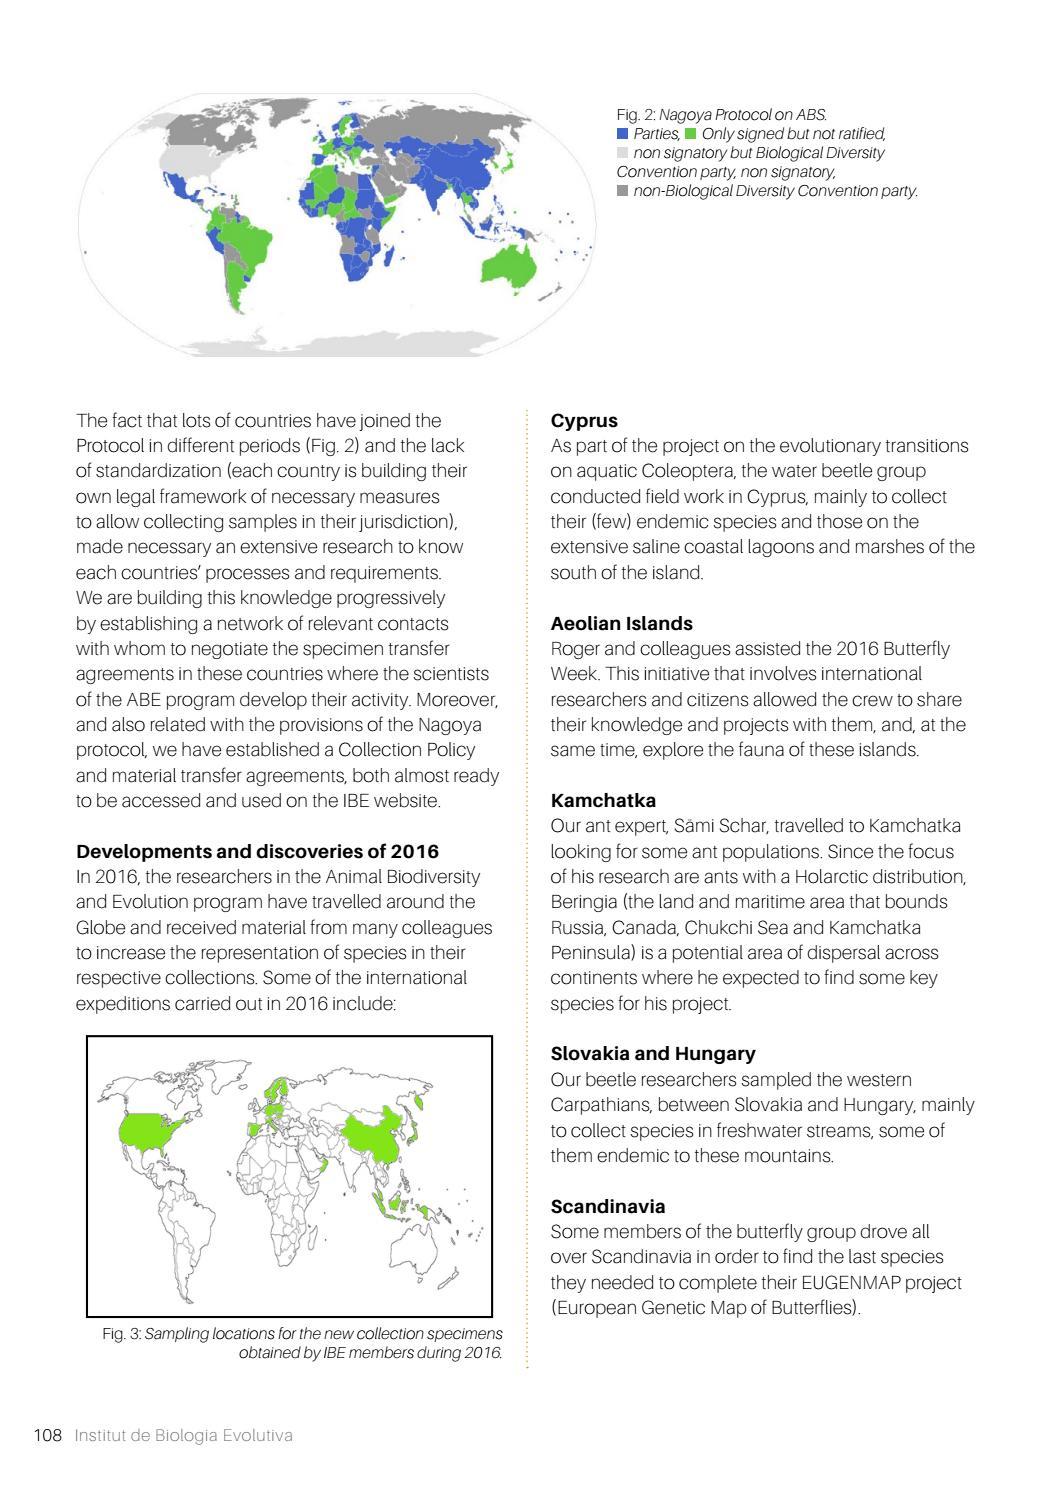 IBE annual report 2016 by Institut de Biologia Evolutiva - issuu